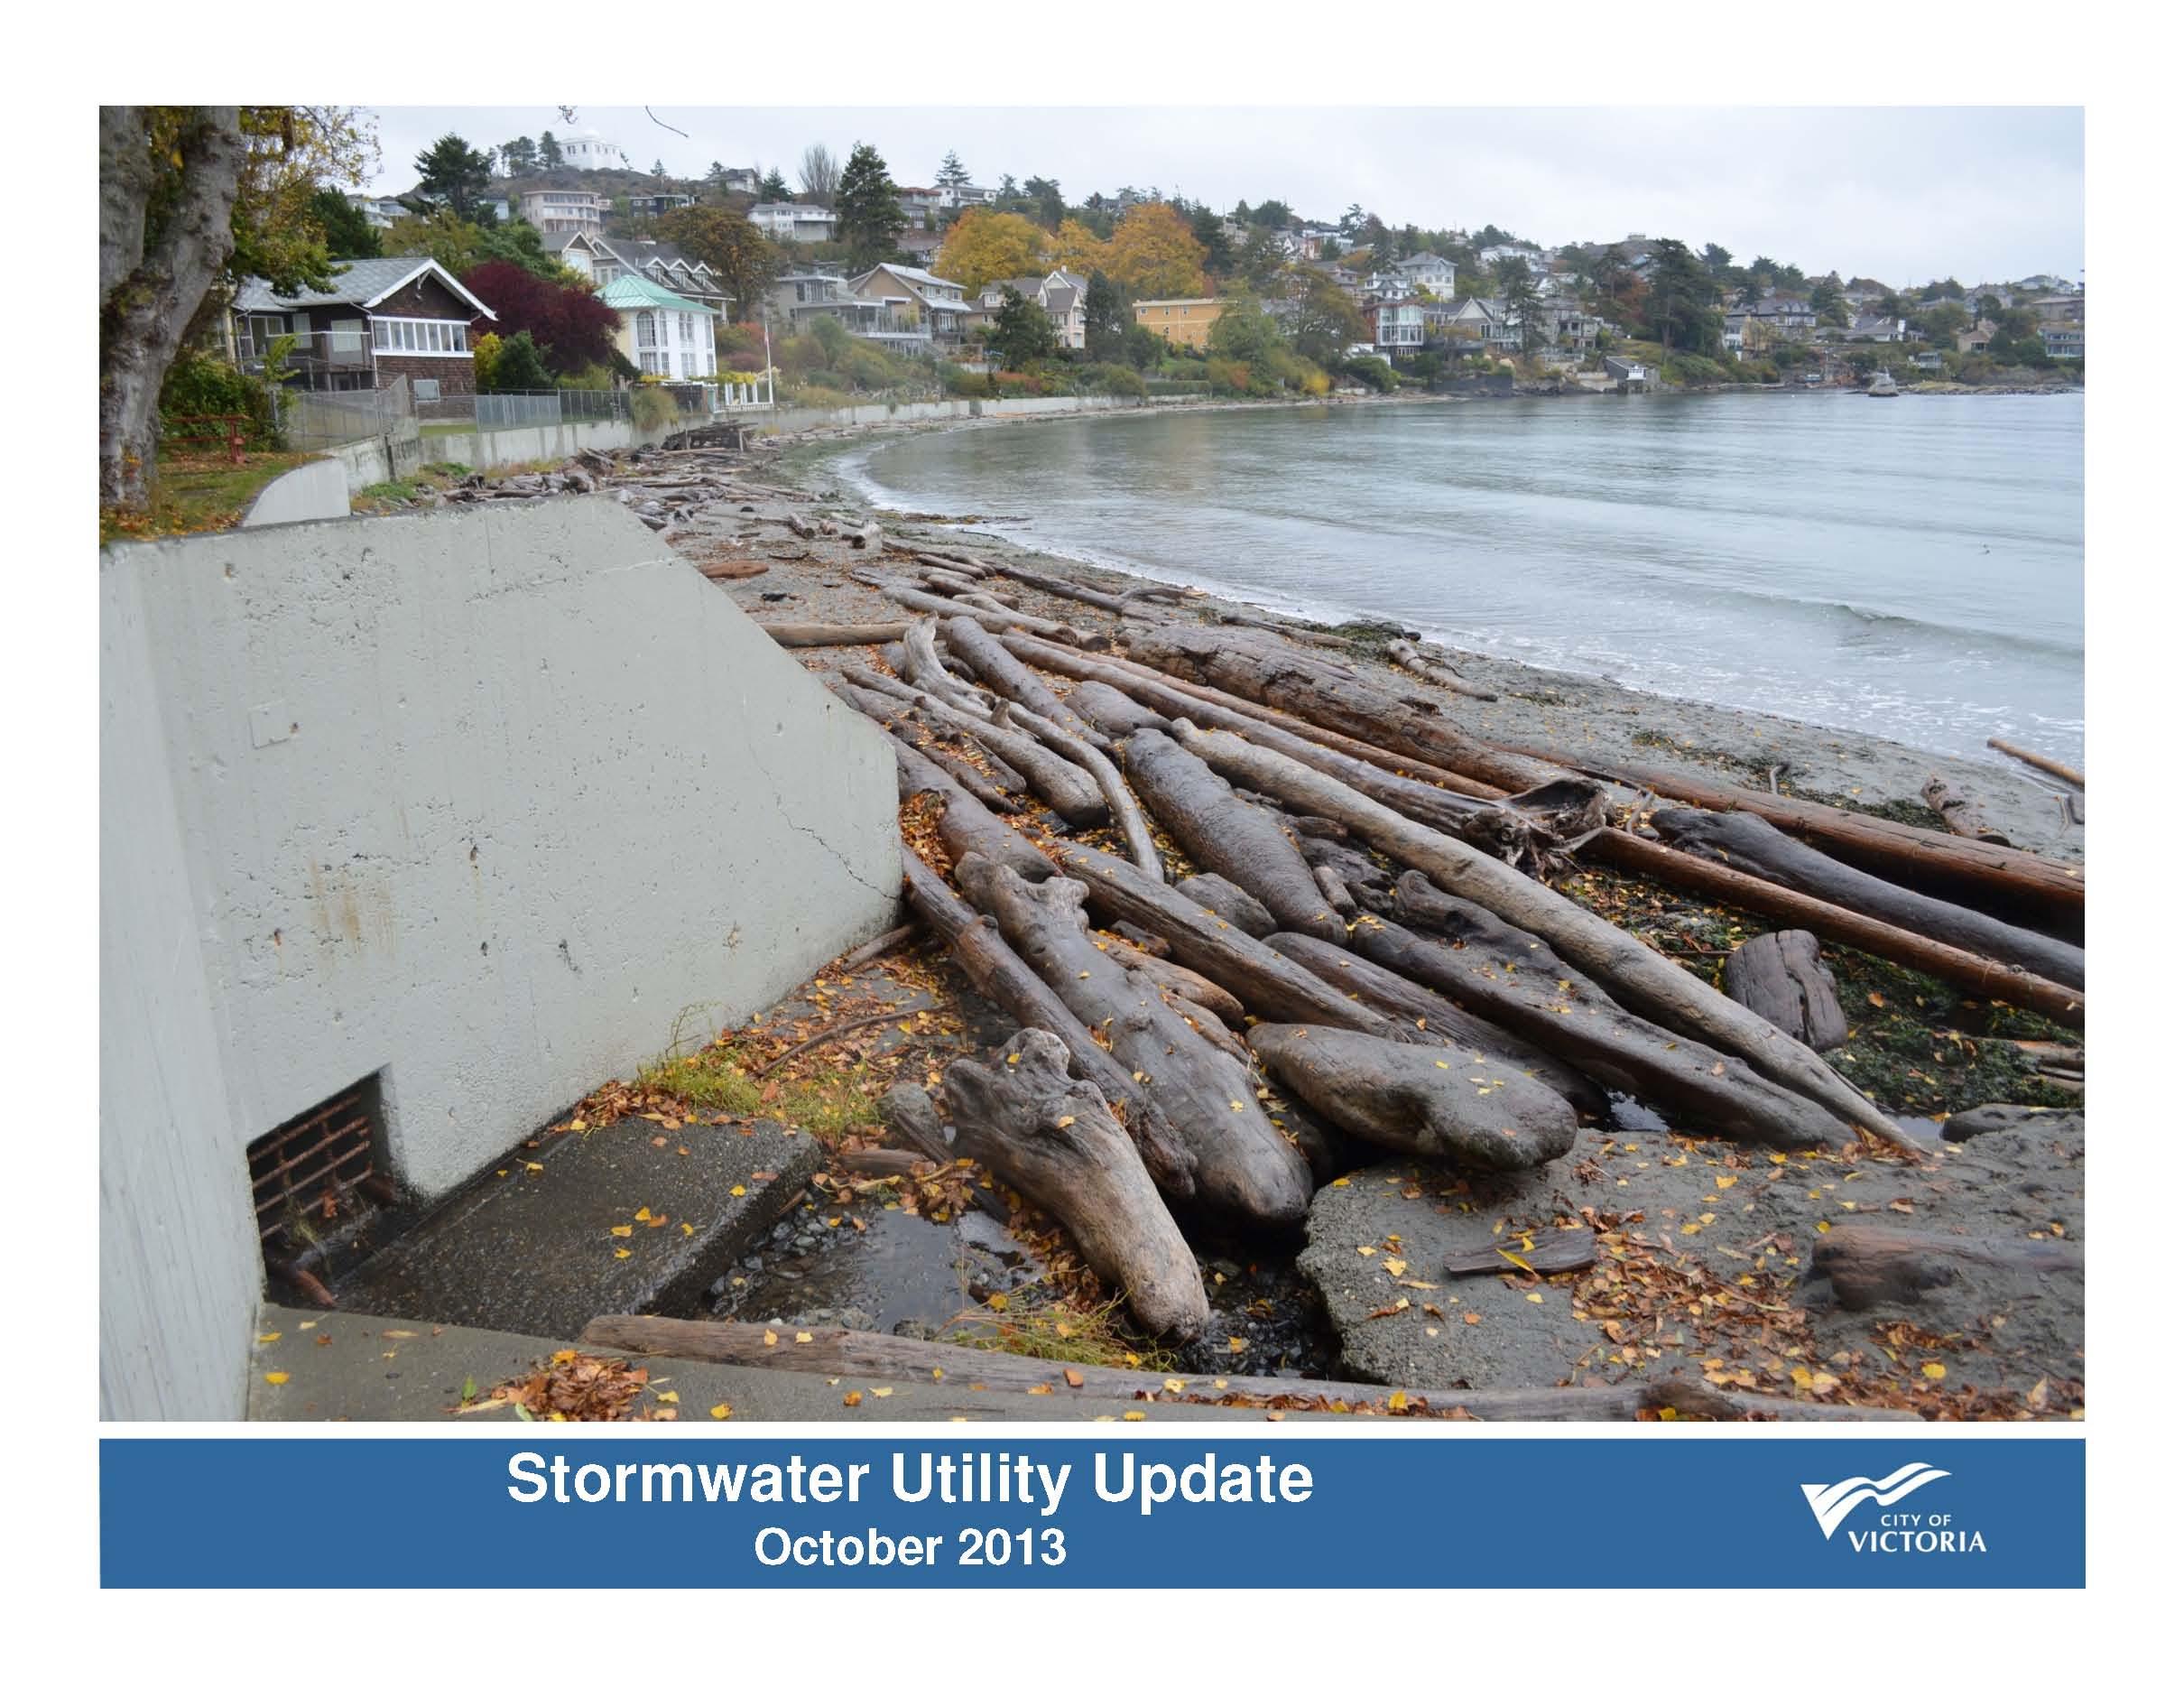 Victoria_Stormwater-Utility_powerpoint-presentation_Oct-2013_title-slide